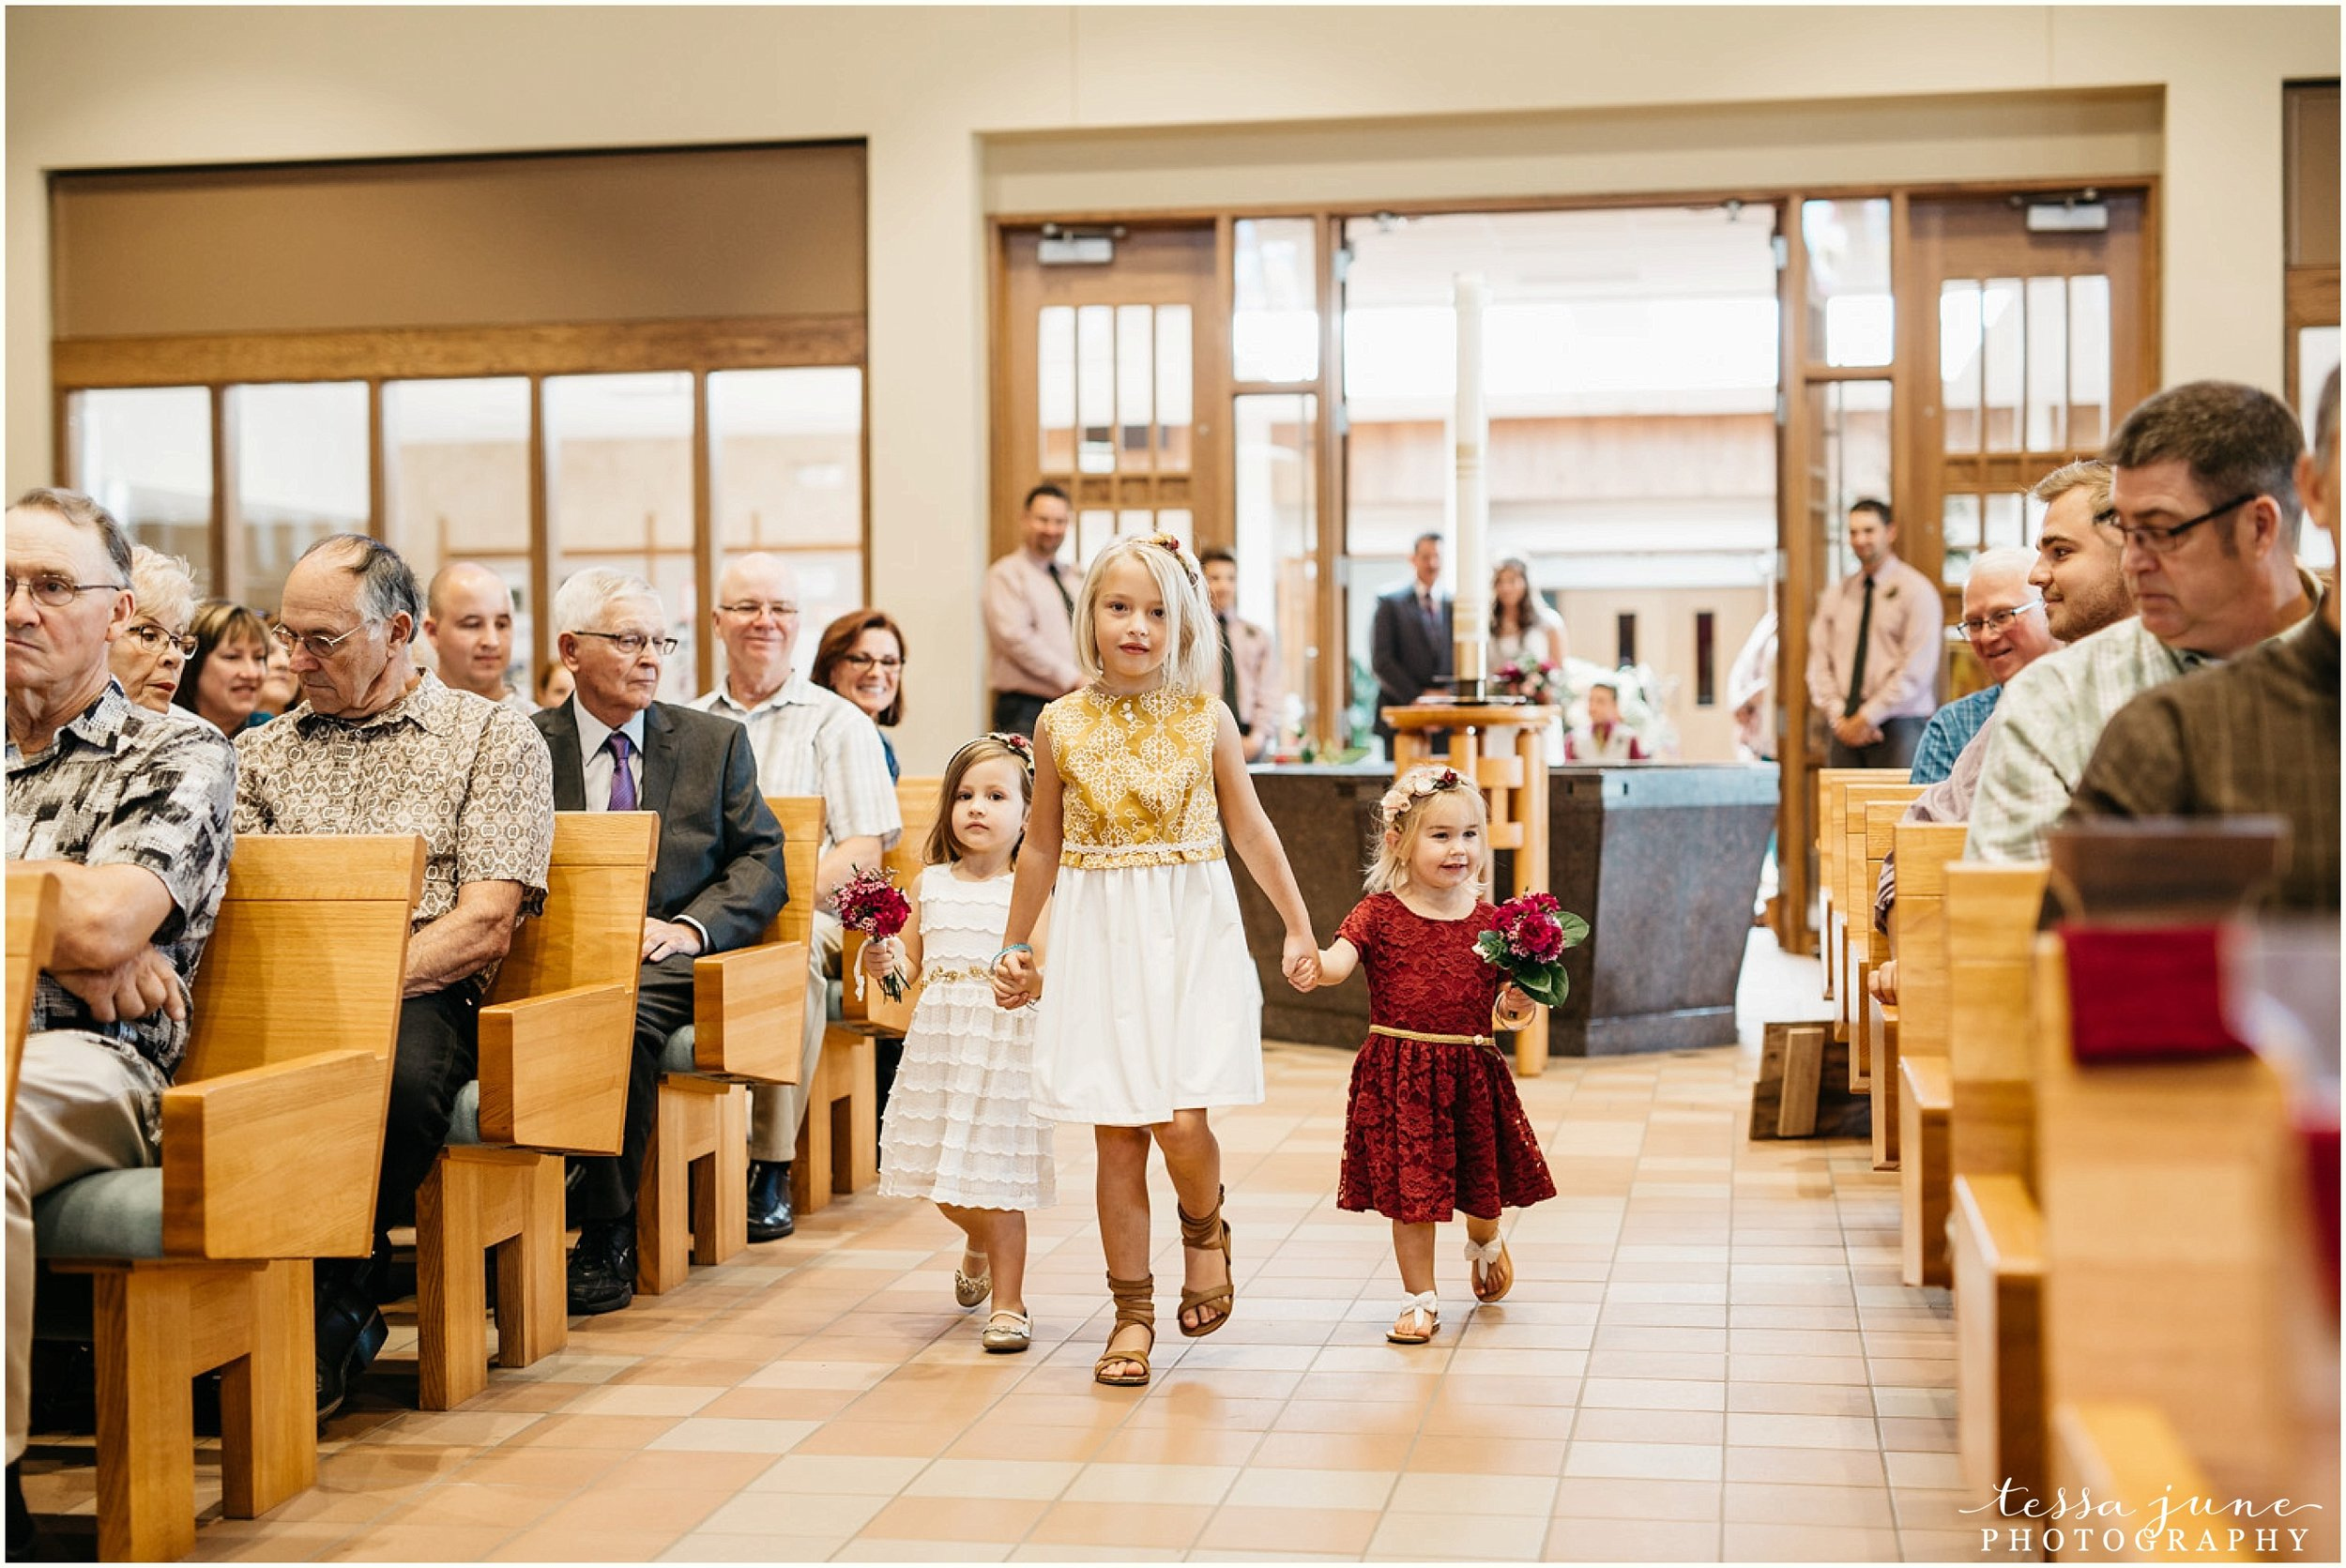 bohemian-minnesota-wedding-mismatched-bridesmaid-dresses-waterfall-st-cloud-tessa-june-photography-100.jpg